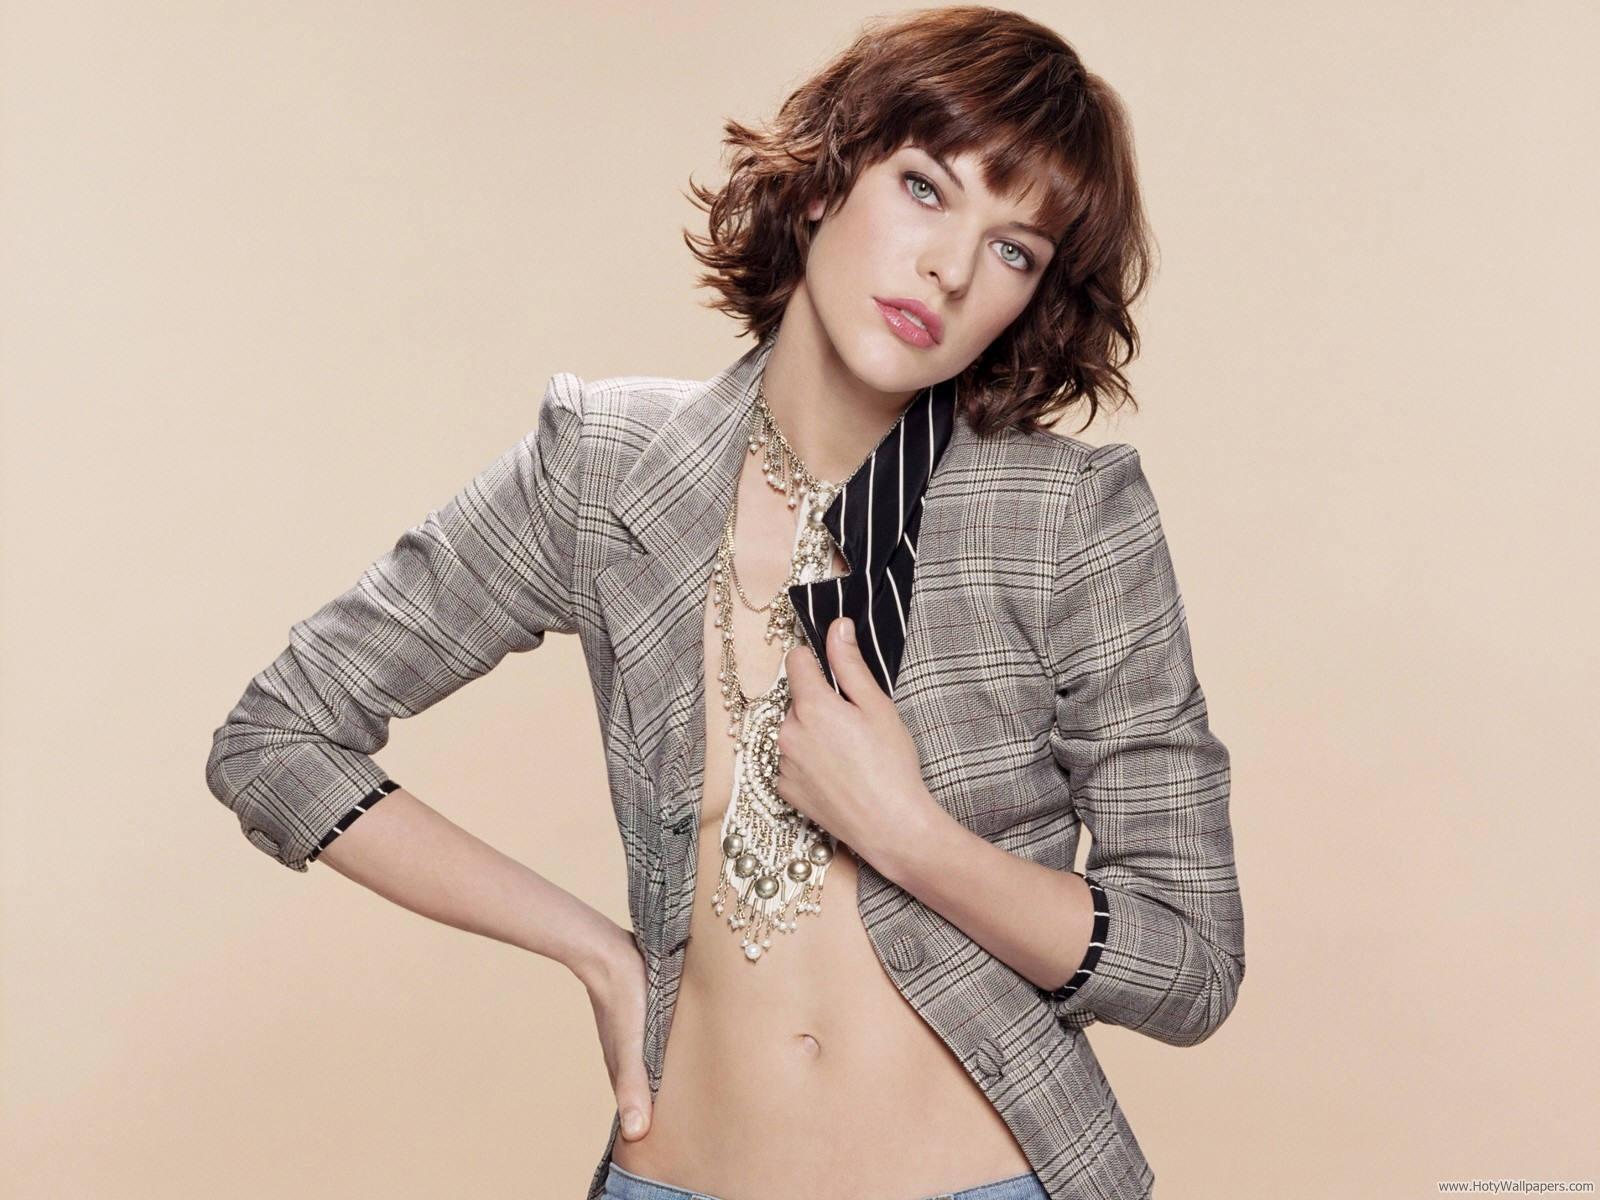 http://3.bp.blogspot.com/-AkCWE_URIZw/TpxUik624kI/AAAAAAAAMTk/x_A14nCEEMg/s1600/milla_jovovich_russian_actress_wallpaper.jpg